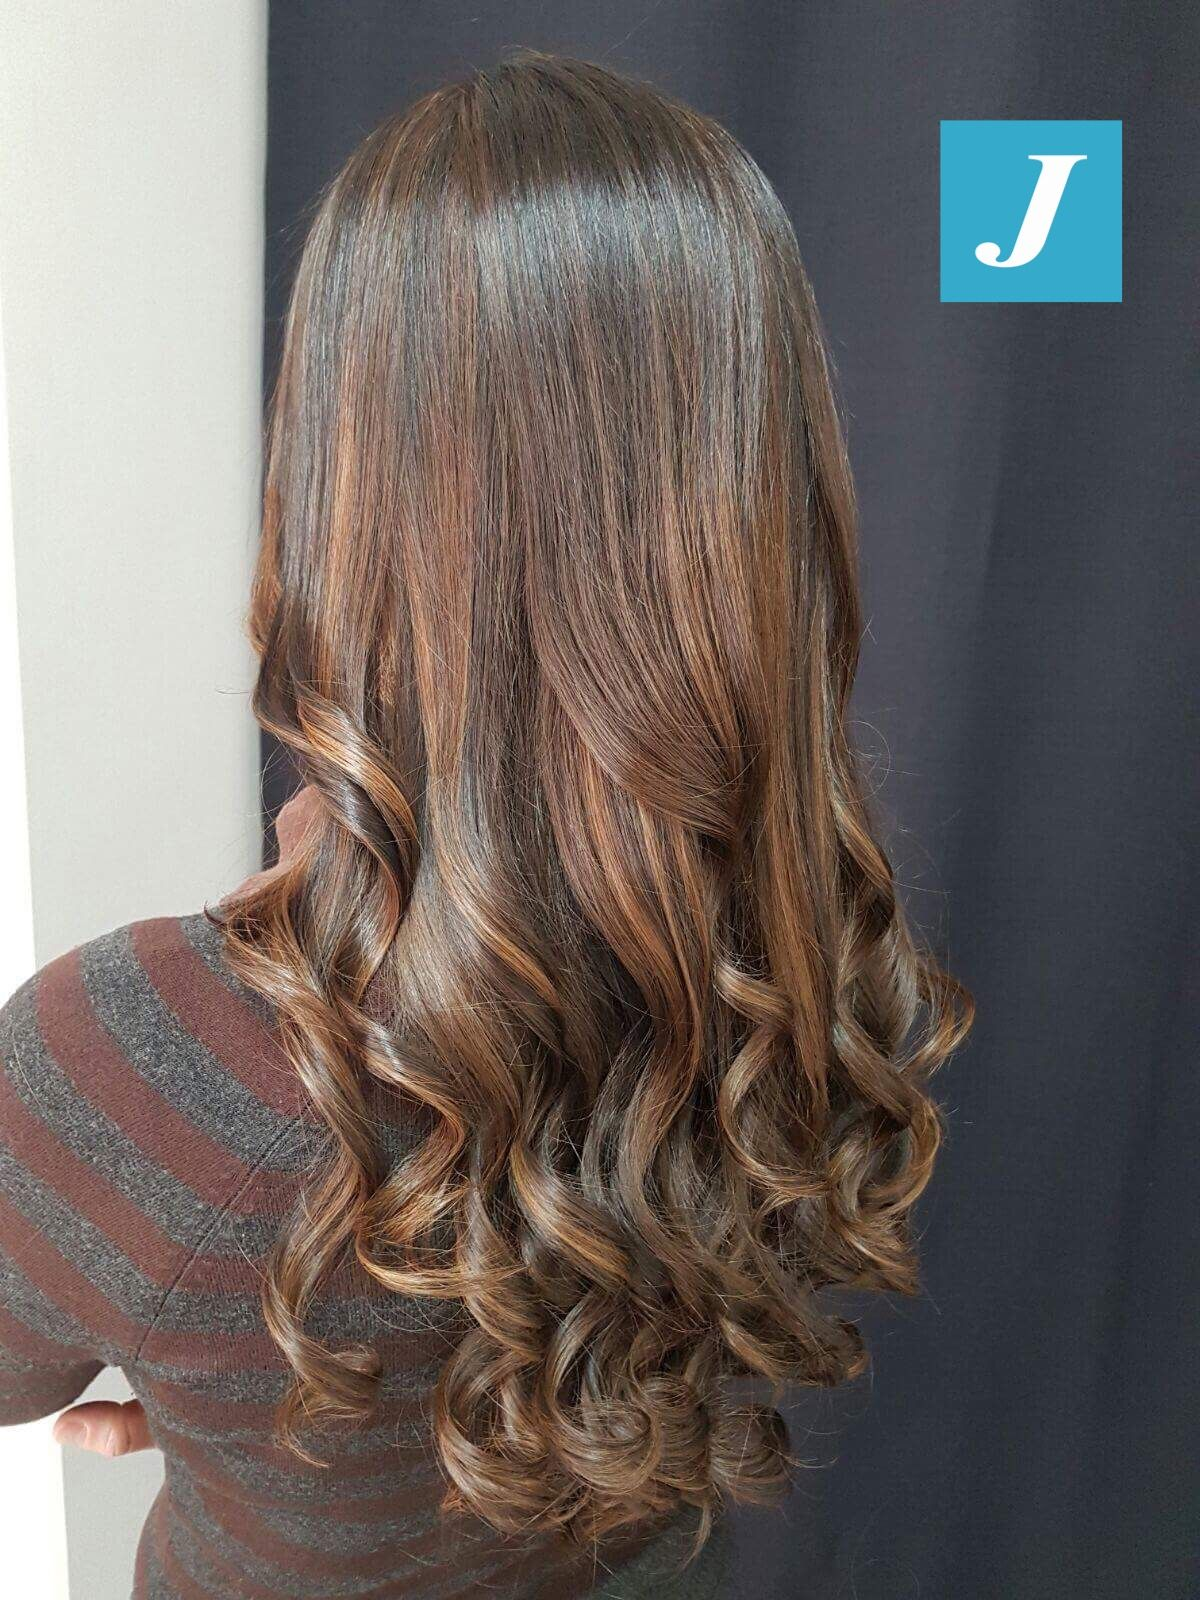 Chocolate | Nutella Shades _ Degradé Joelle #cdj #degradejoelle #tagliopuntearia #degradé #igers #musthave #hair #hairstyle #haircolour #longhair #ootd #hairfashion #madeinitaly #wellastudionyc